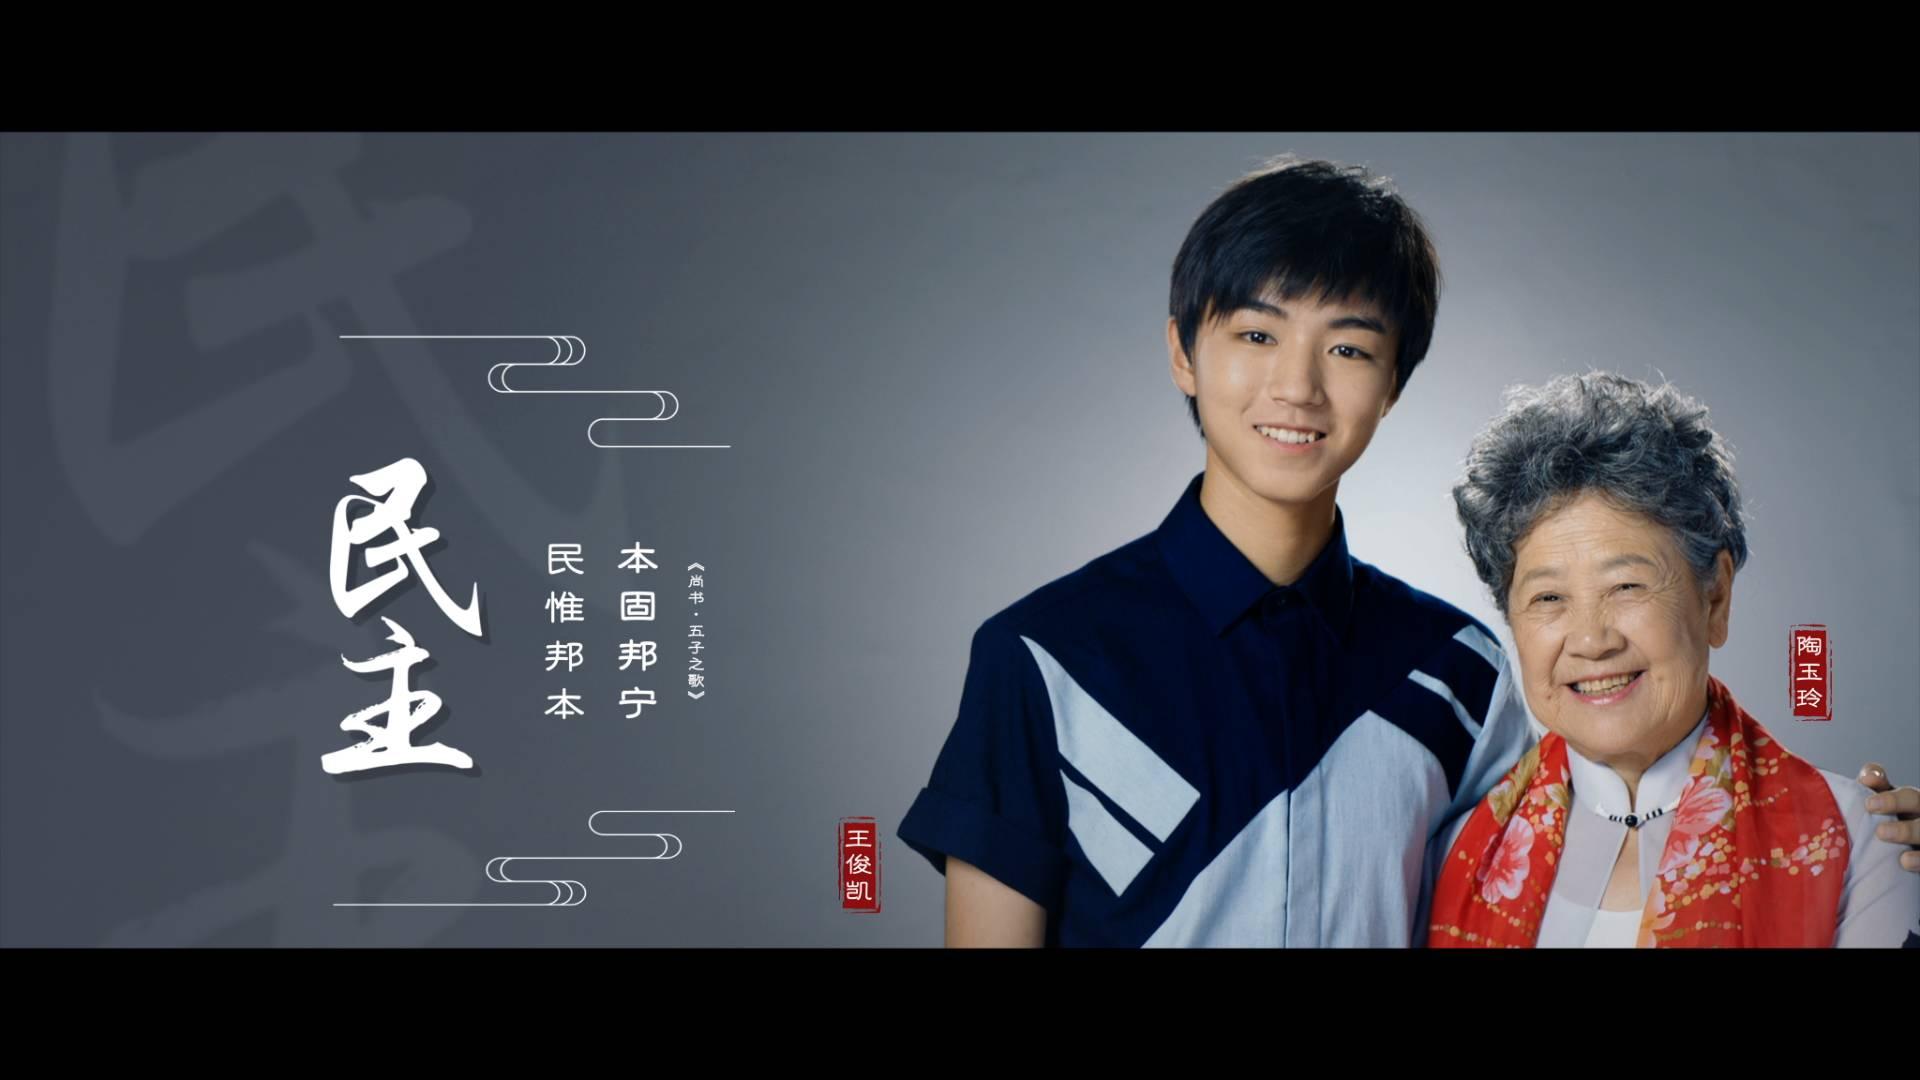 1920x1080中国梦